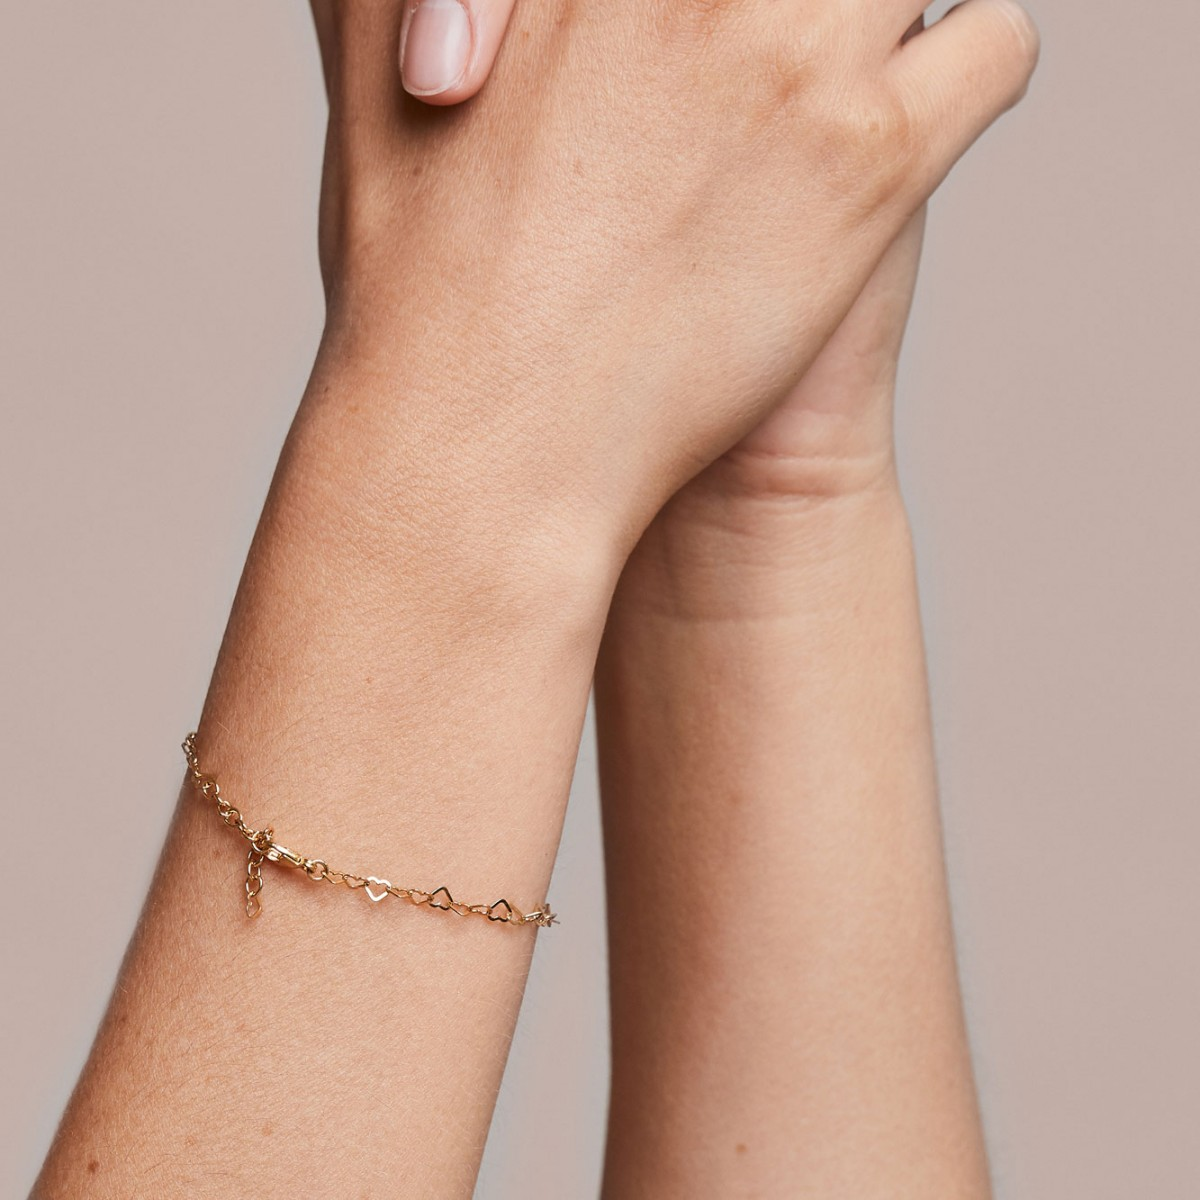 just diamonds bracelet - 925 sterlingsilber weiß rhodiniert